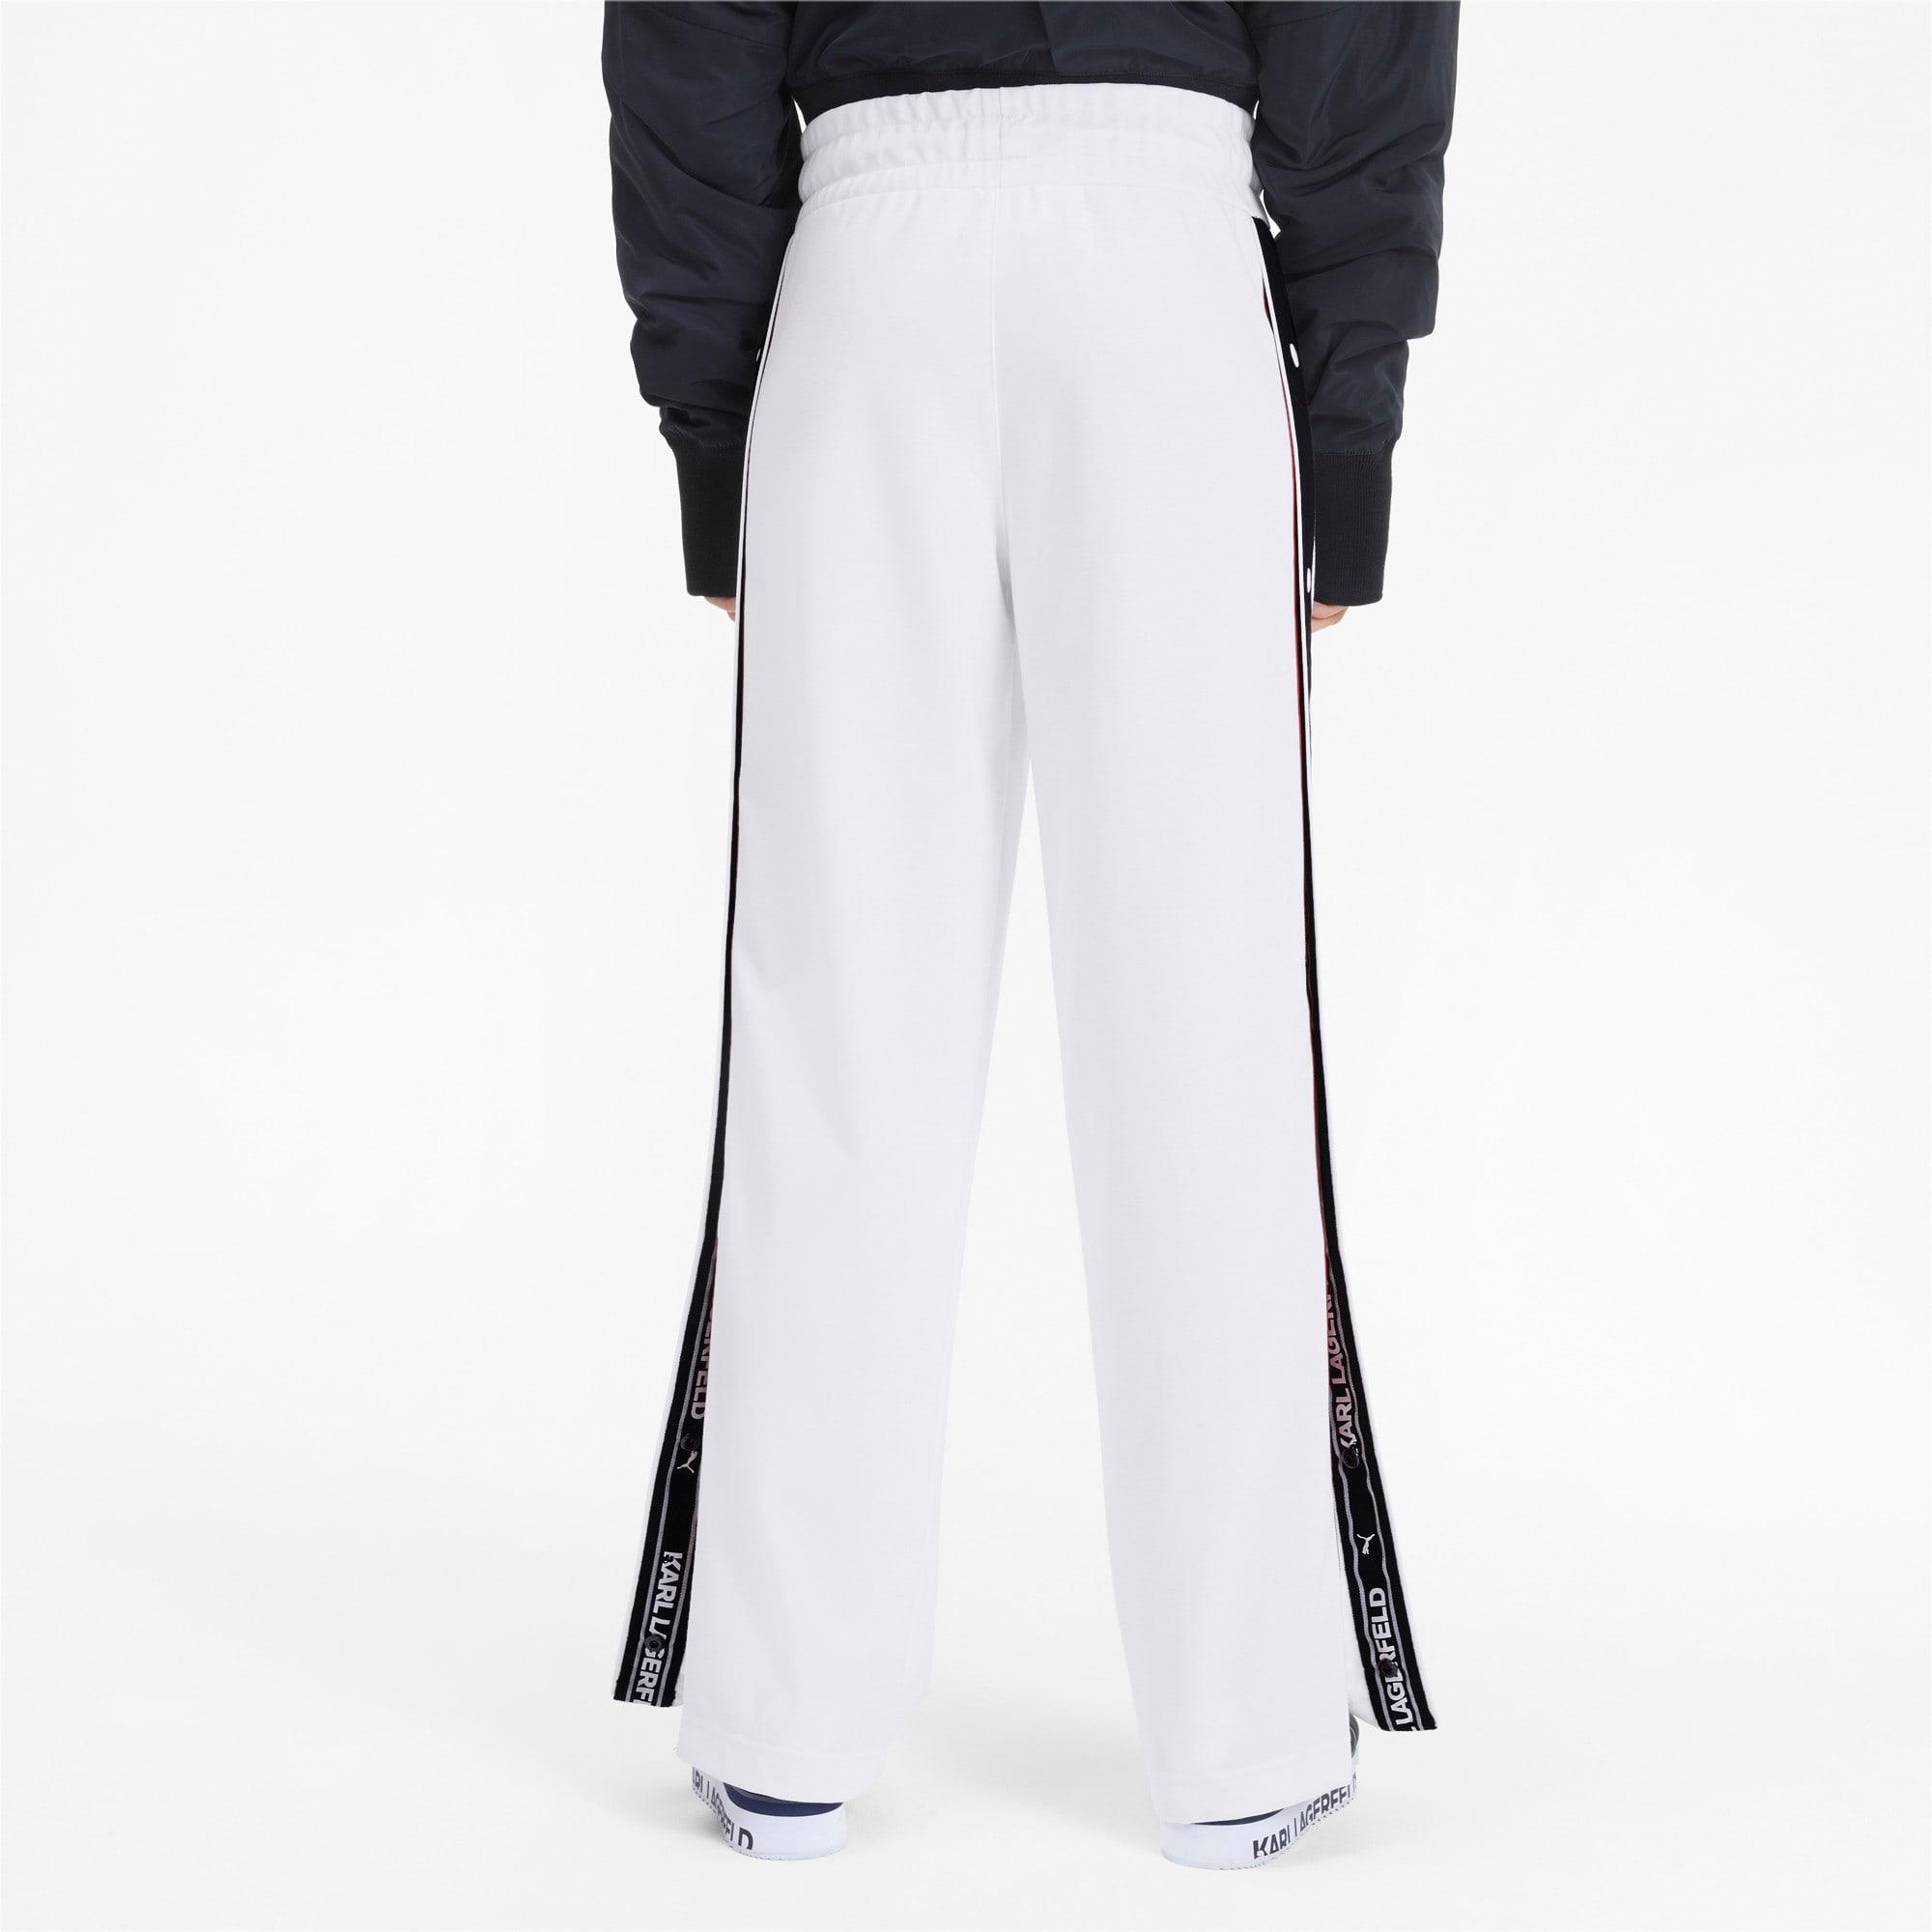 Thumbnail 2 of PUMA x KARL LAGERFELD Women's Wide Pants, Puma White, medium